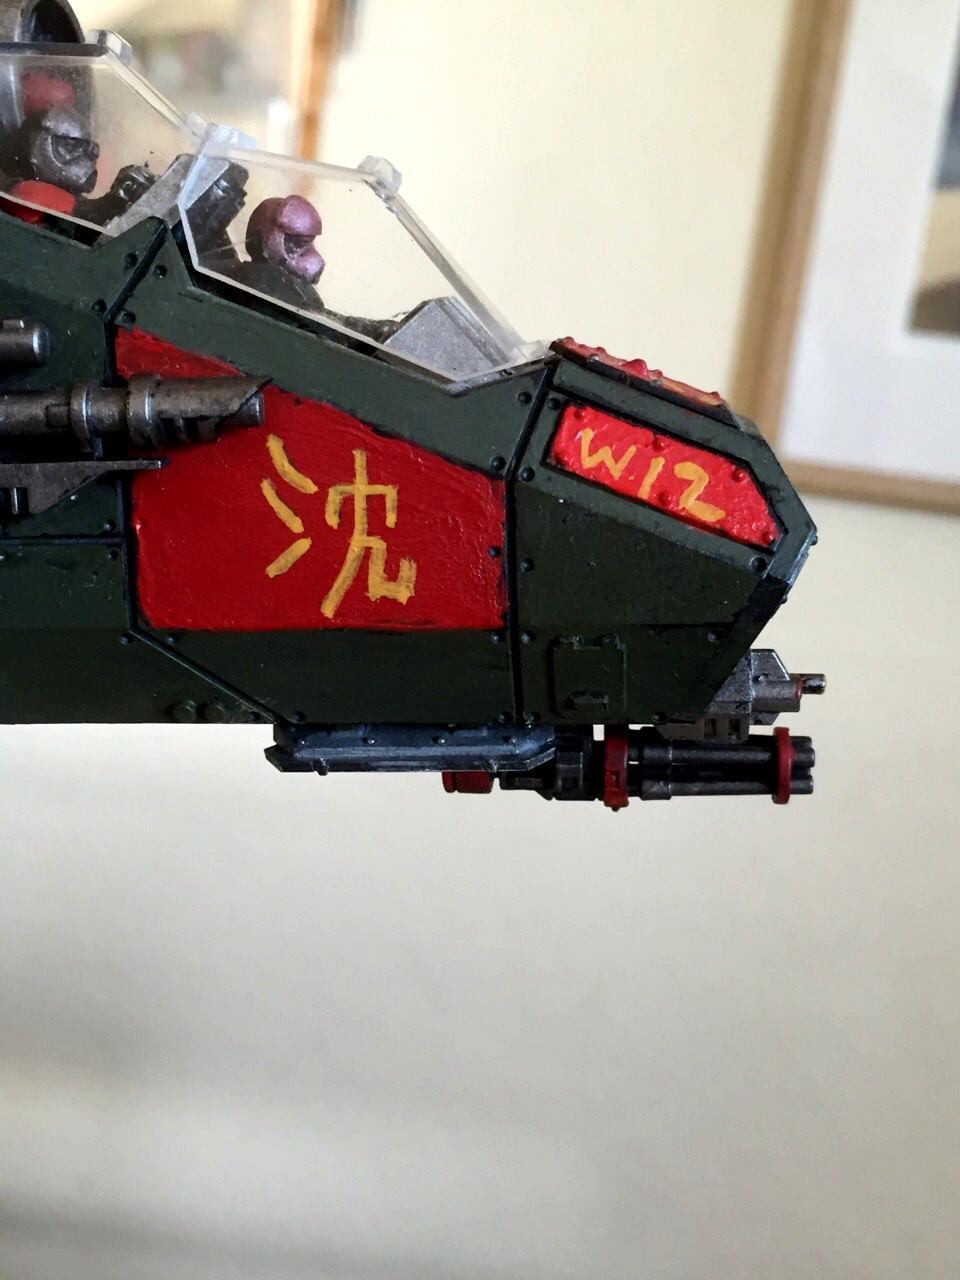 Am, Astra, ĸå›½ï¼Œchina, Burst Cannon, Chinese, Flyer, Freehand, Imperial Guard, Militarium, Nose Art, Vendetta